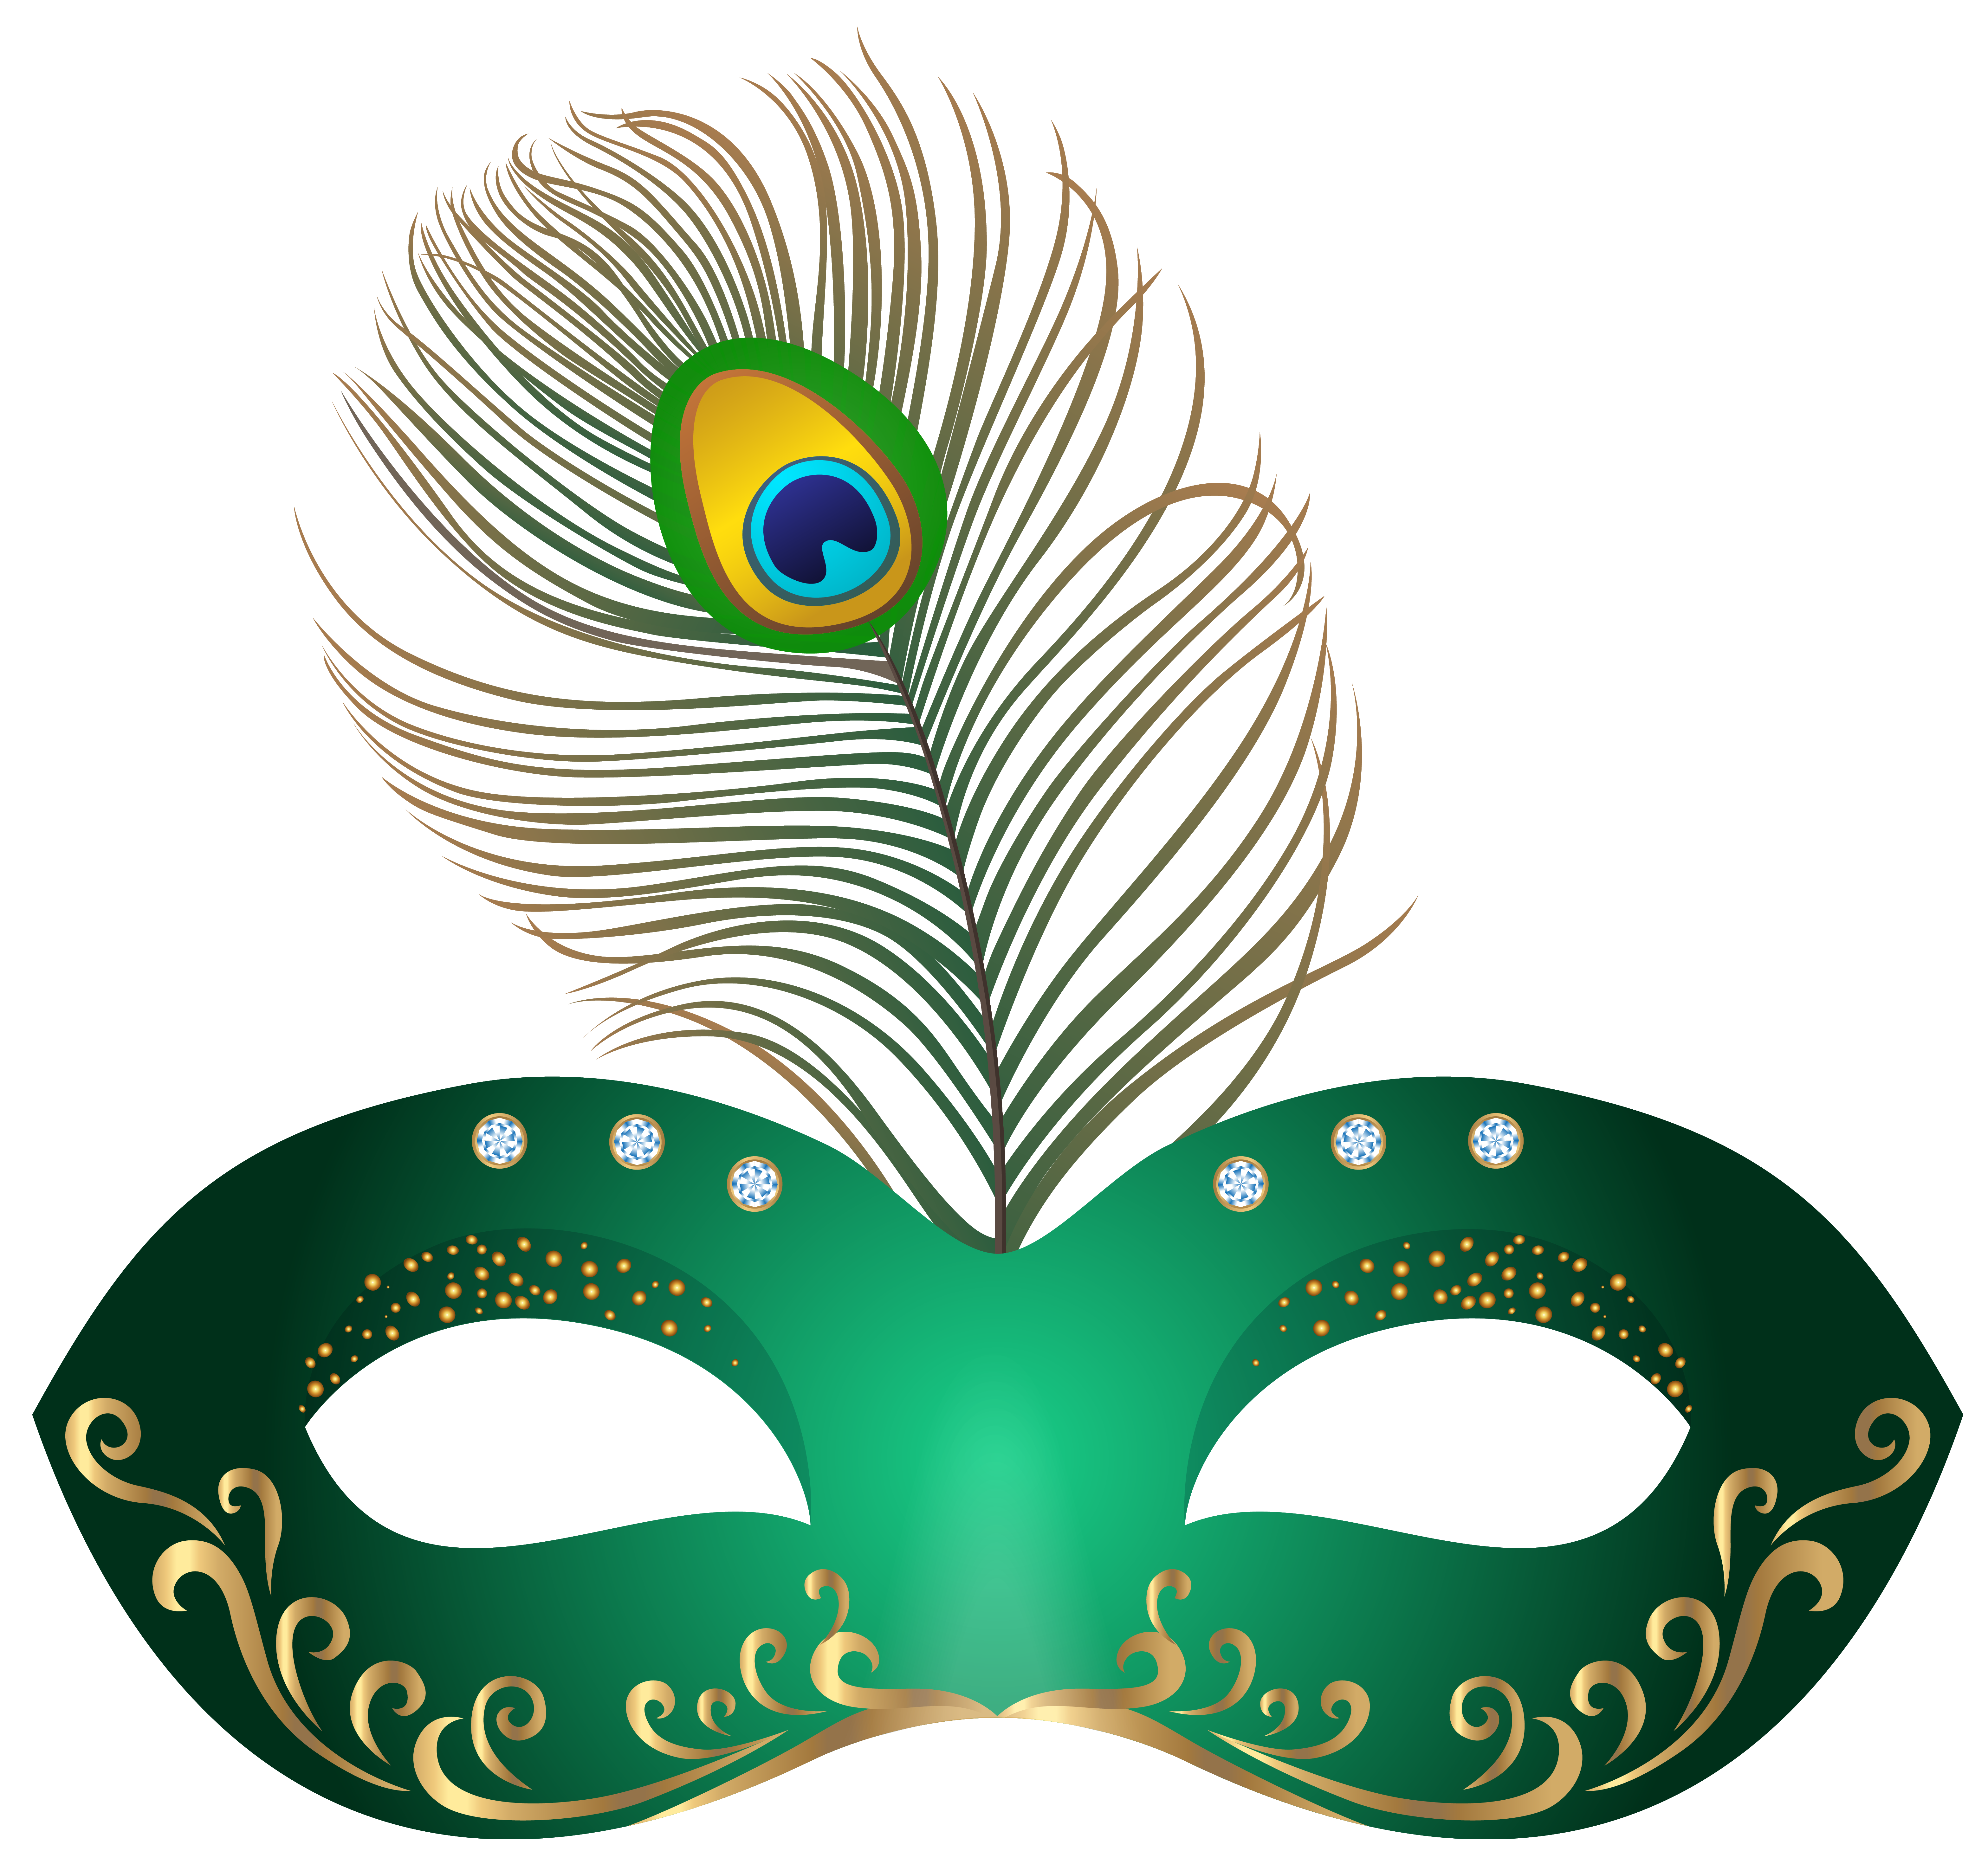 6271x5881 Green Carnival Mask Png Clip Art Imageu200b Gallery Yopriceville